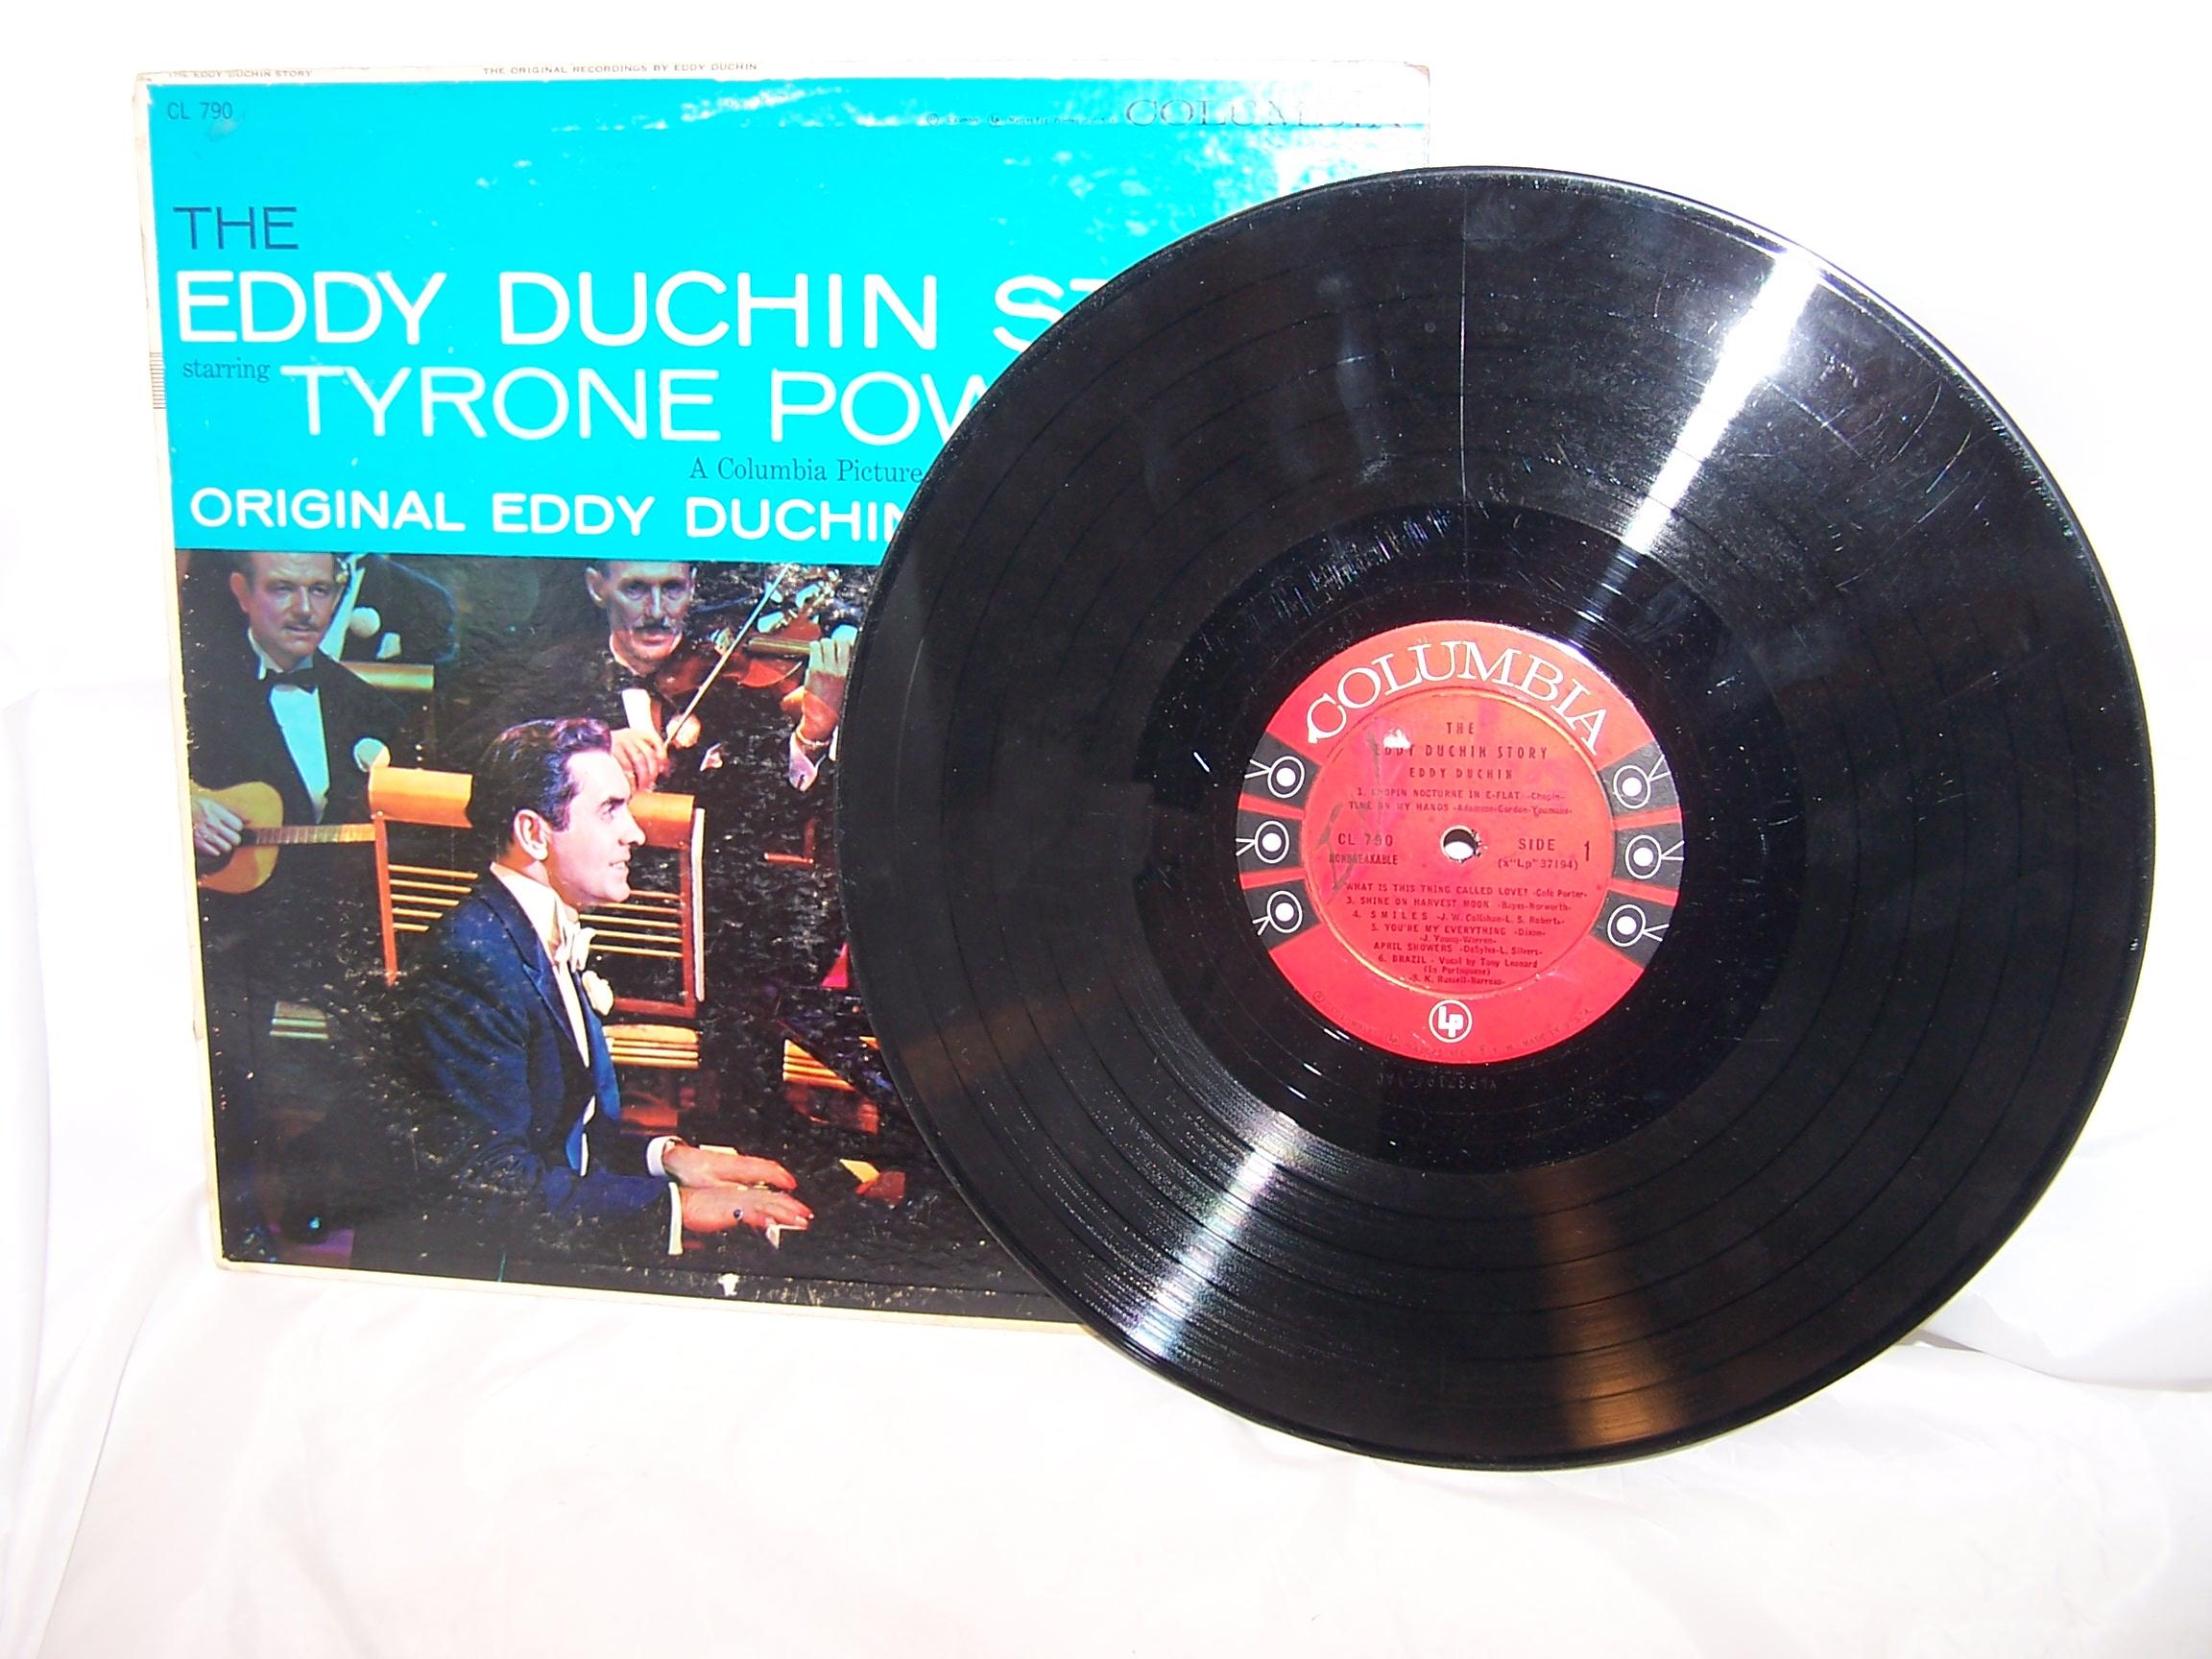 Image 3 of Eddy Duchin Story Record Album, Columbia, Tyrone Power